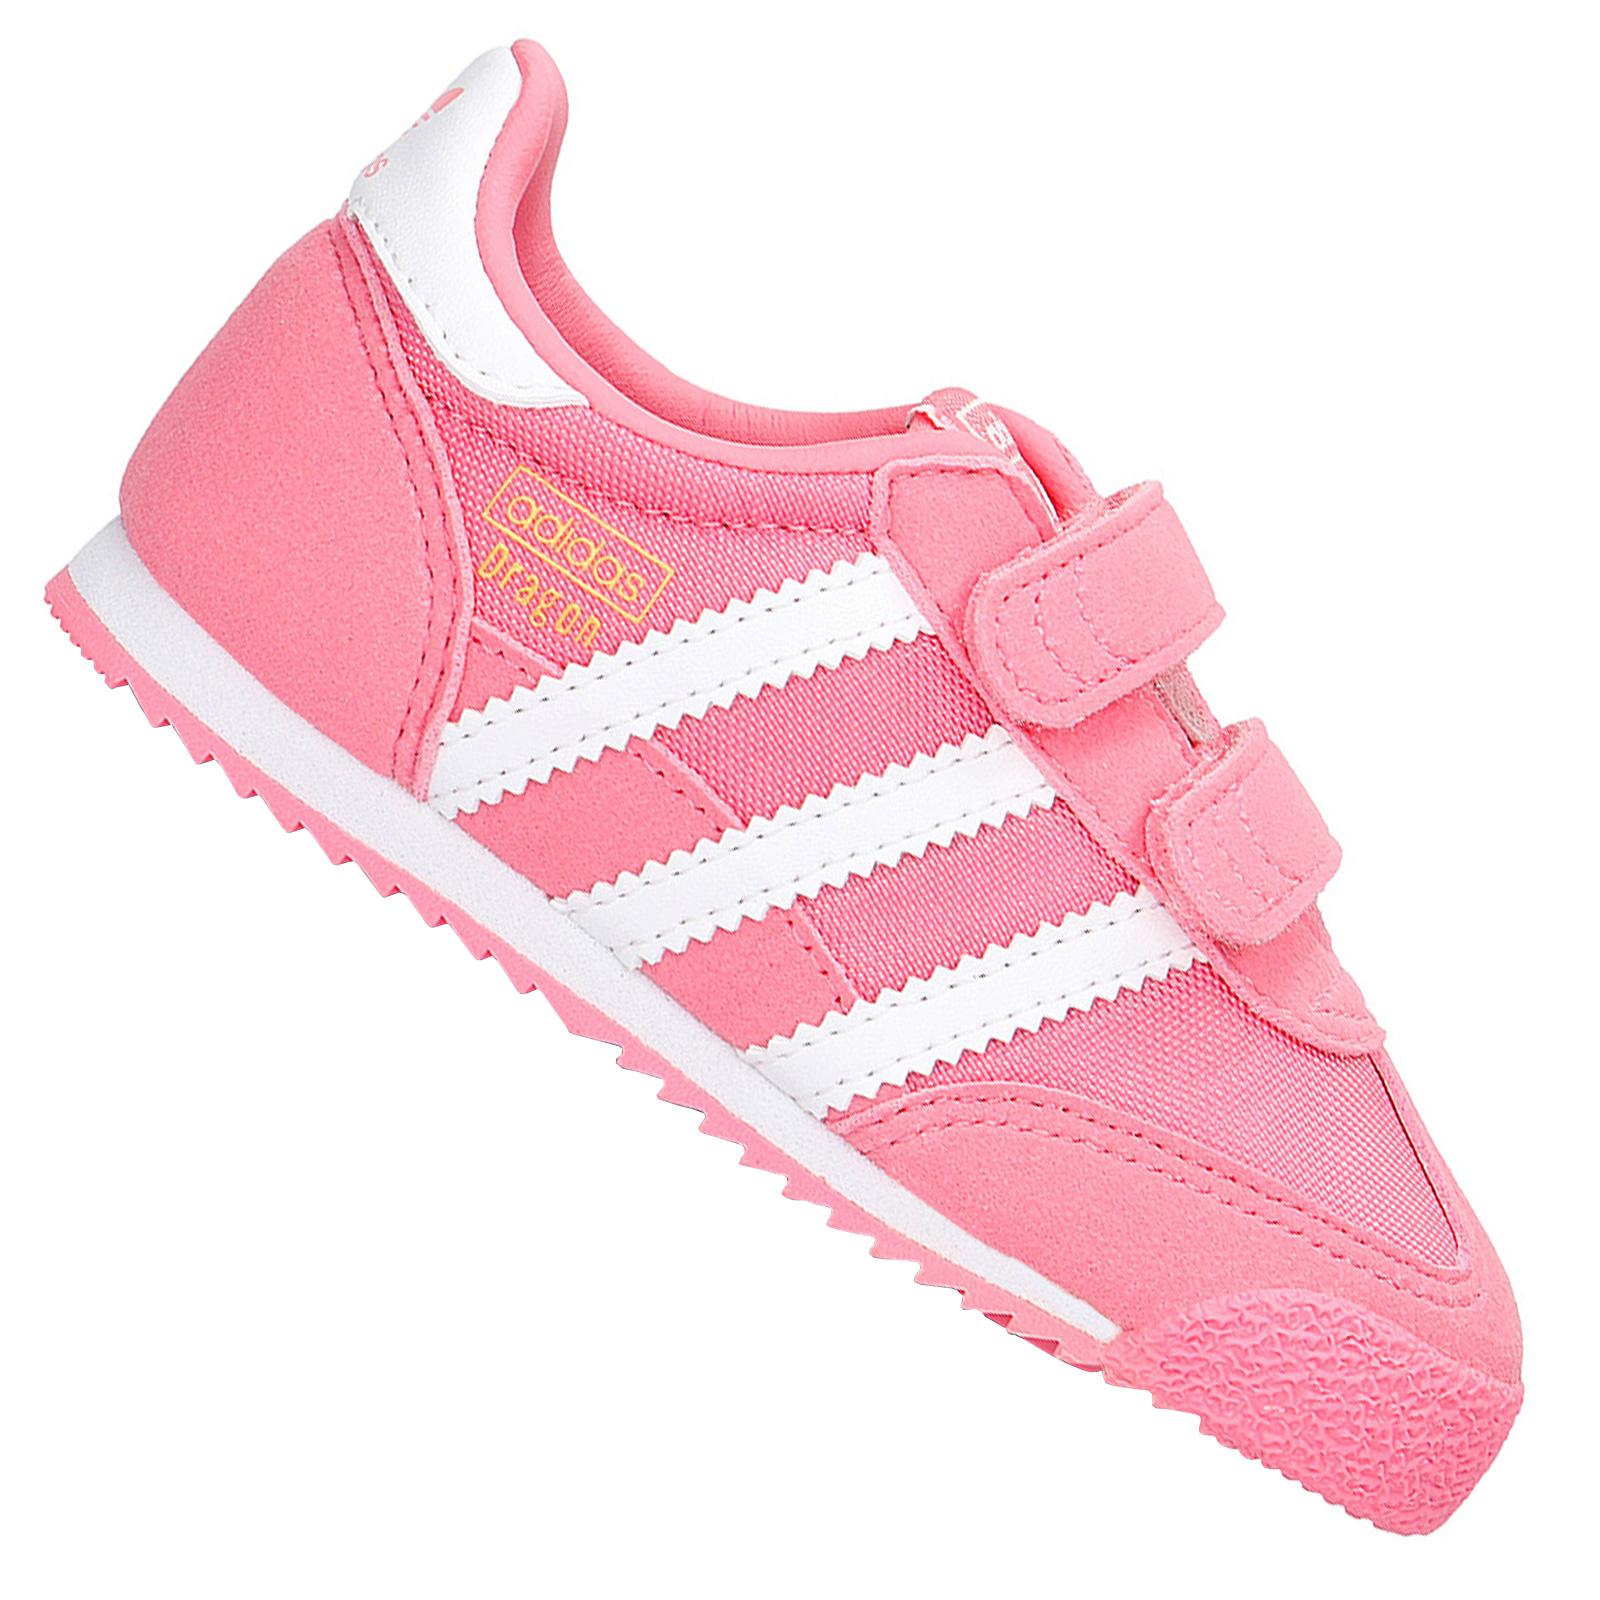 Weiß Bb2500rosa Originals Lauflern Kinder Schuhe Adidas Mädchen Dragon DHEY2e9WI